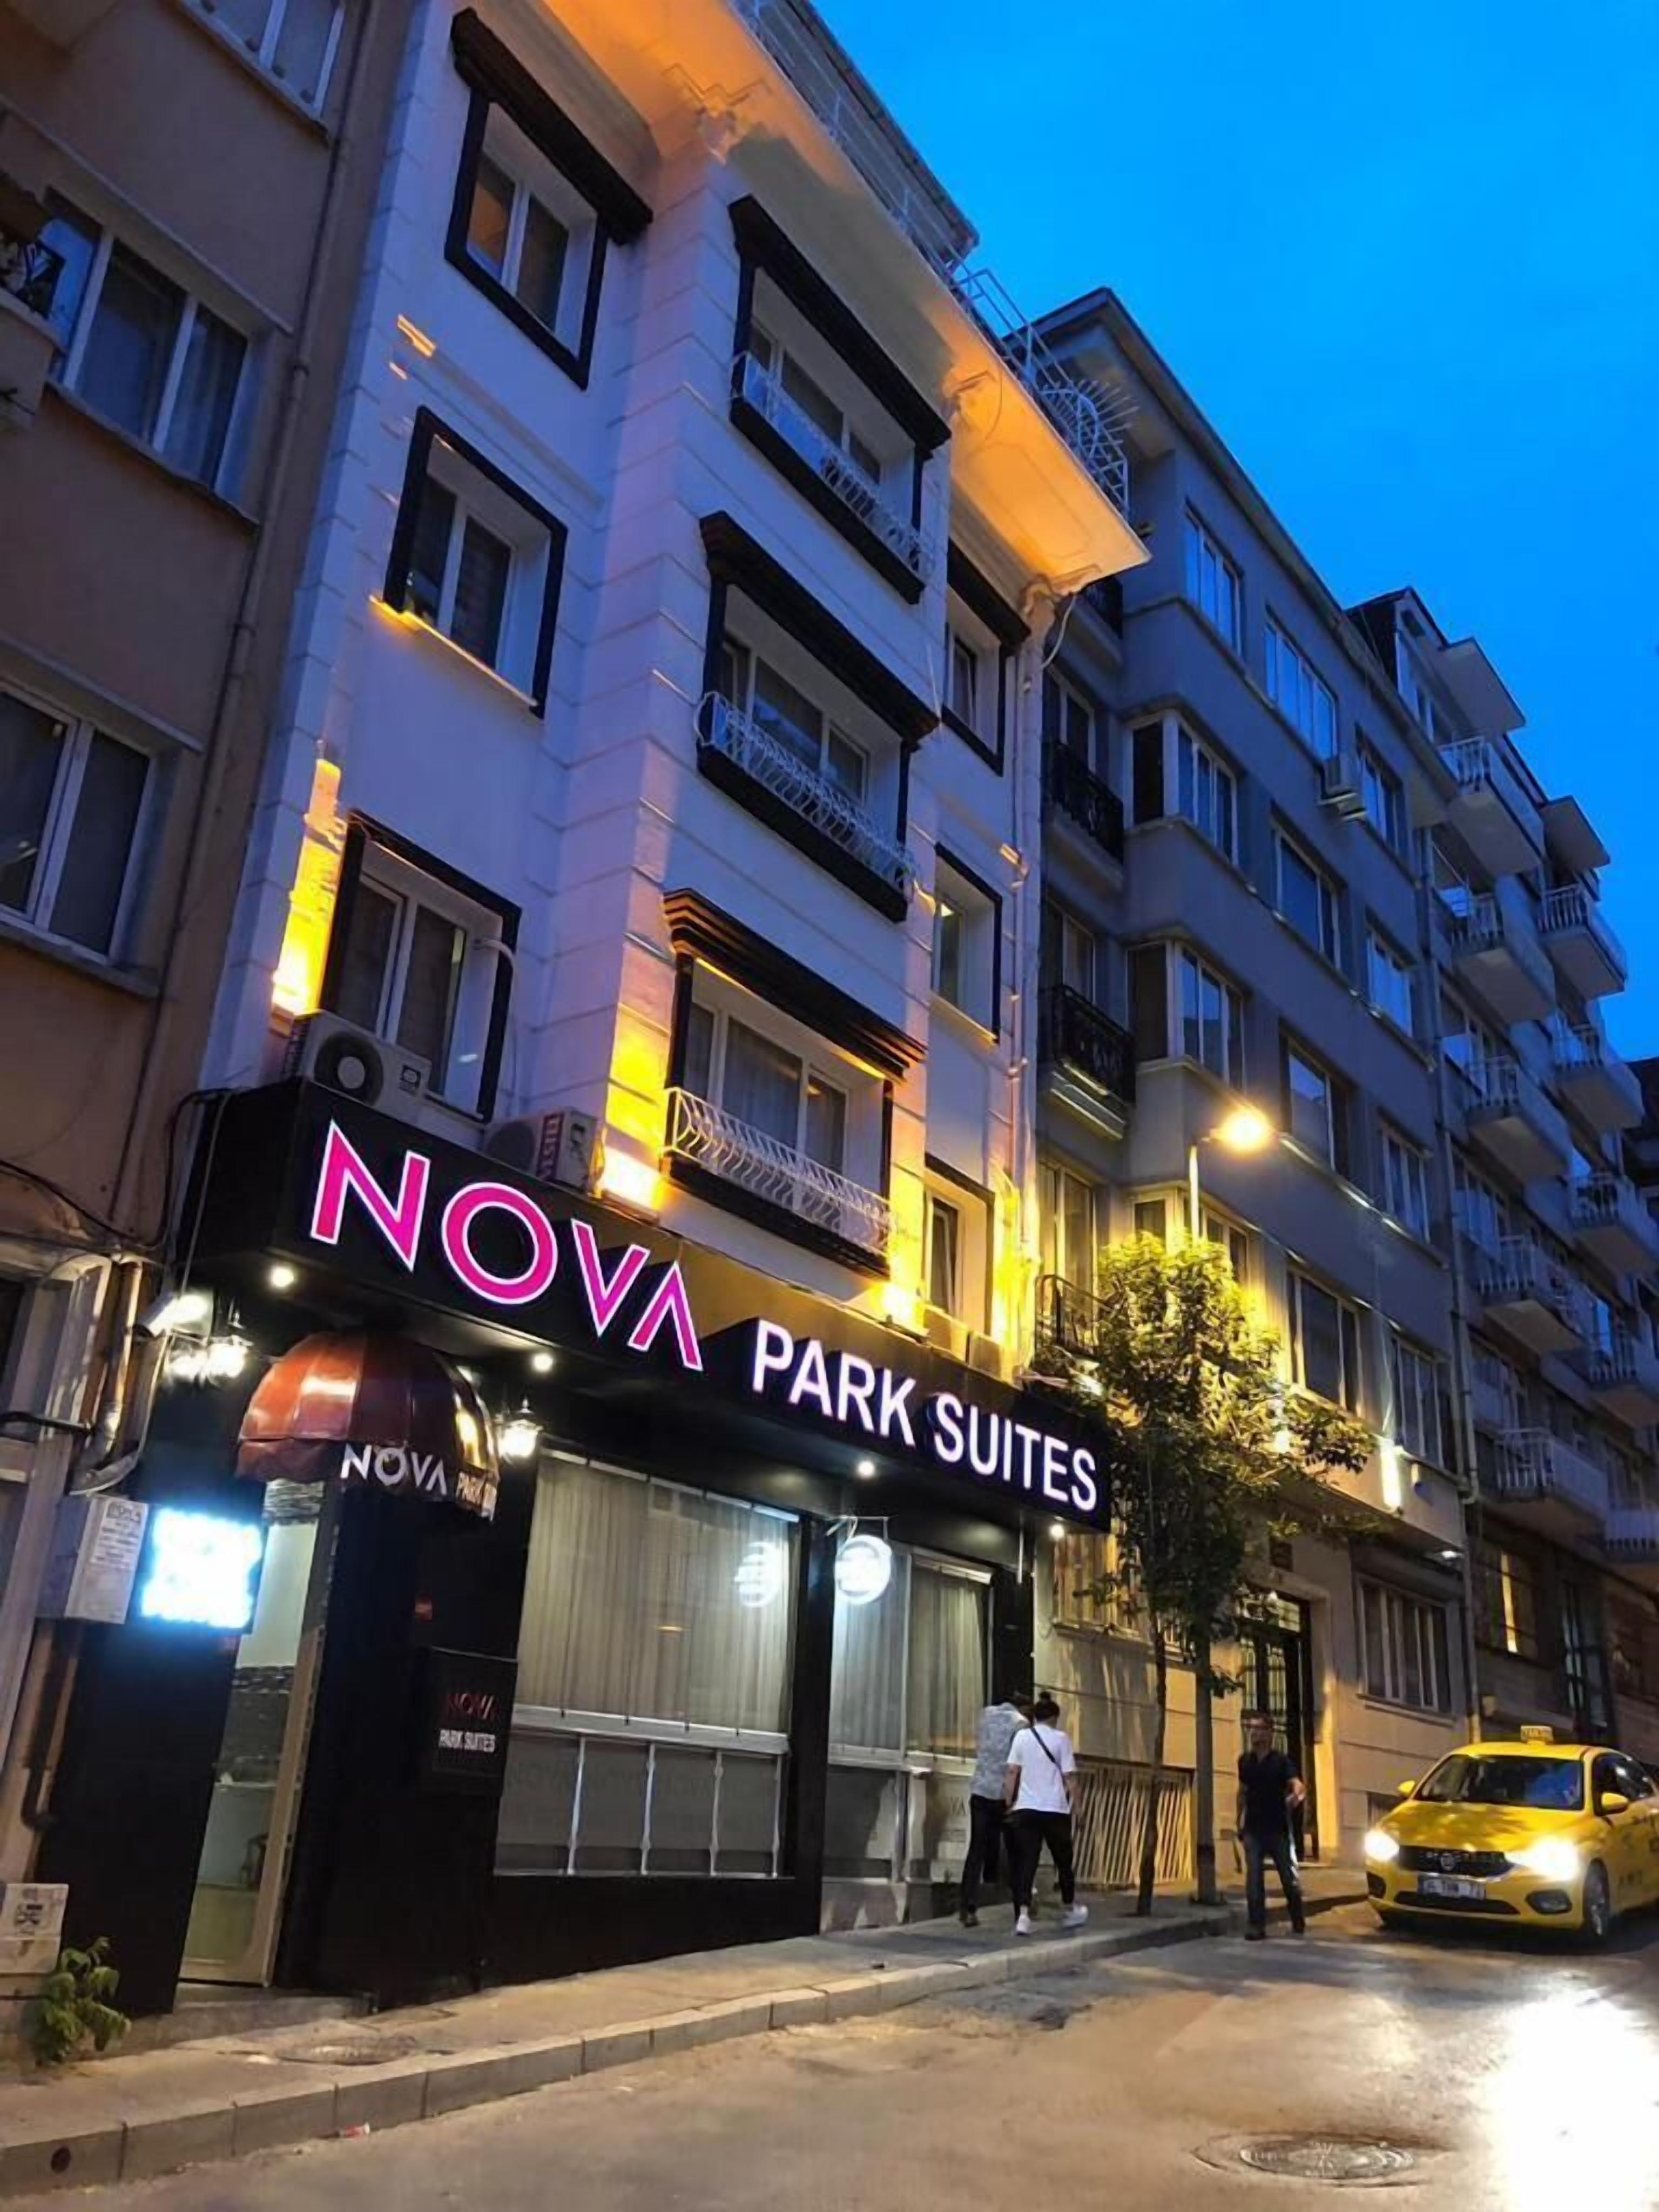 Nova Park Hotel And Suite